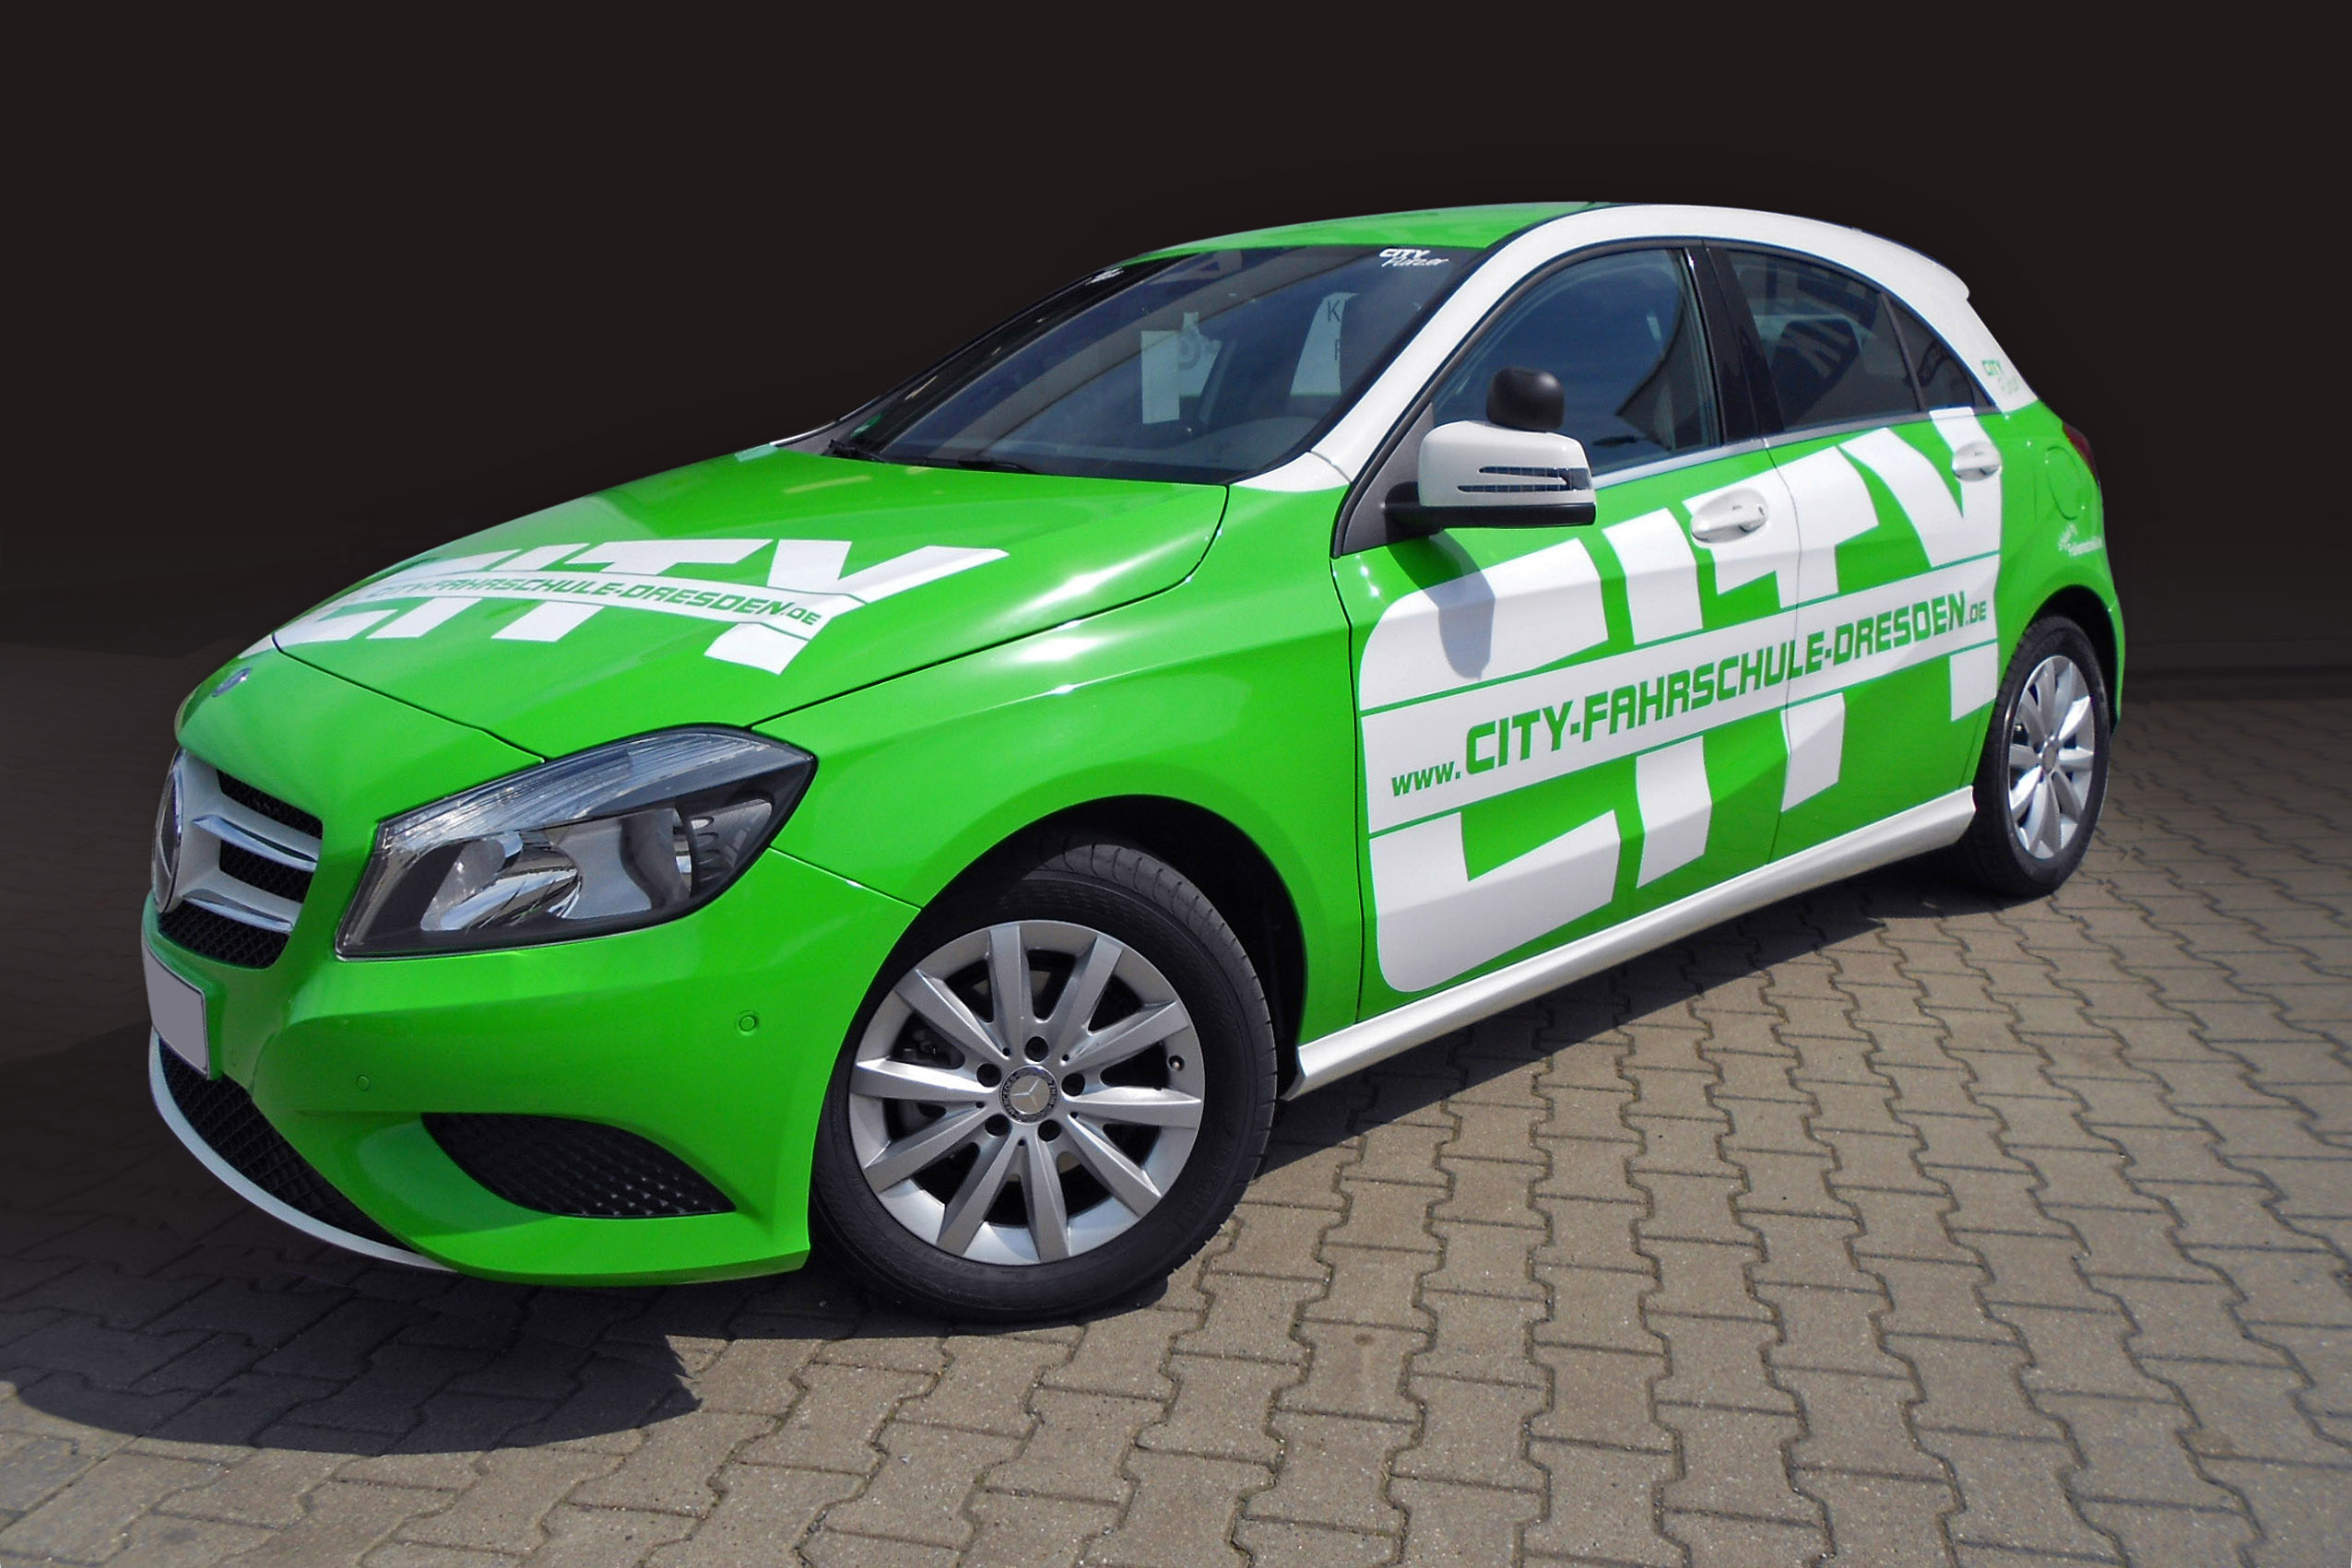 City Fahrschule | KFZ-Werbung